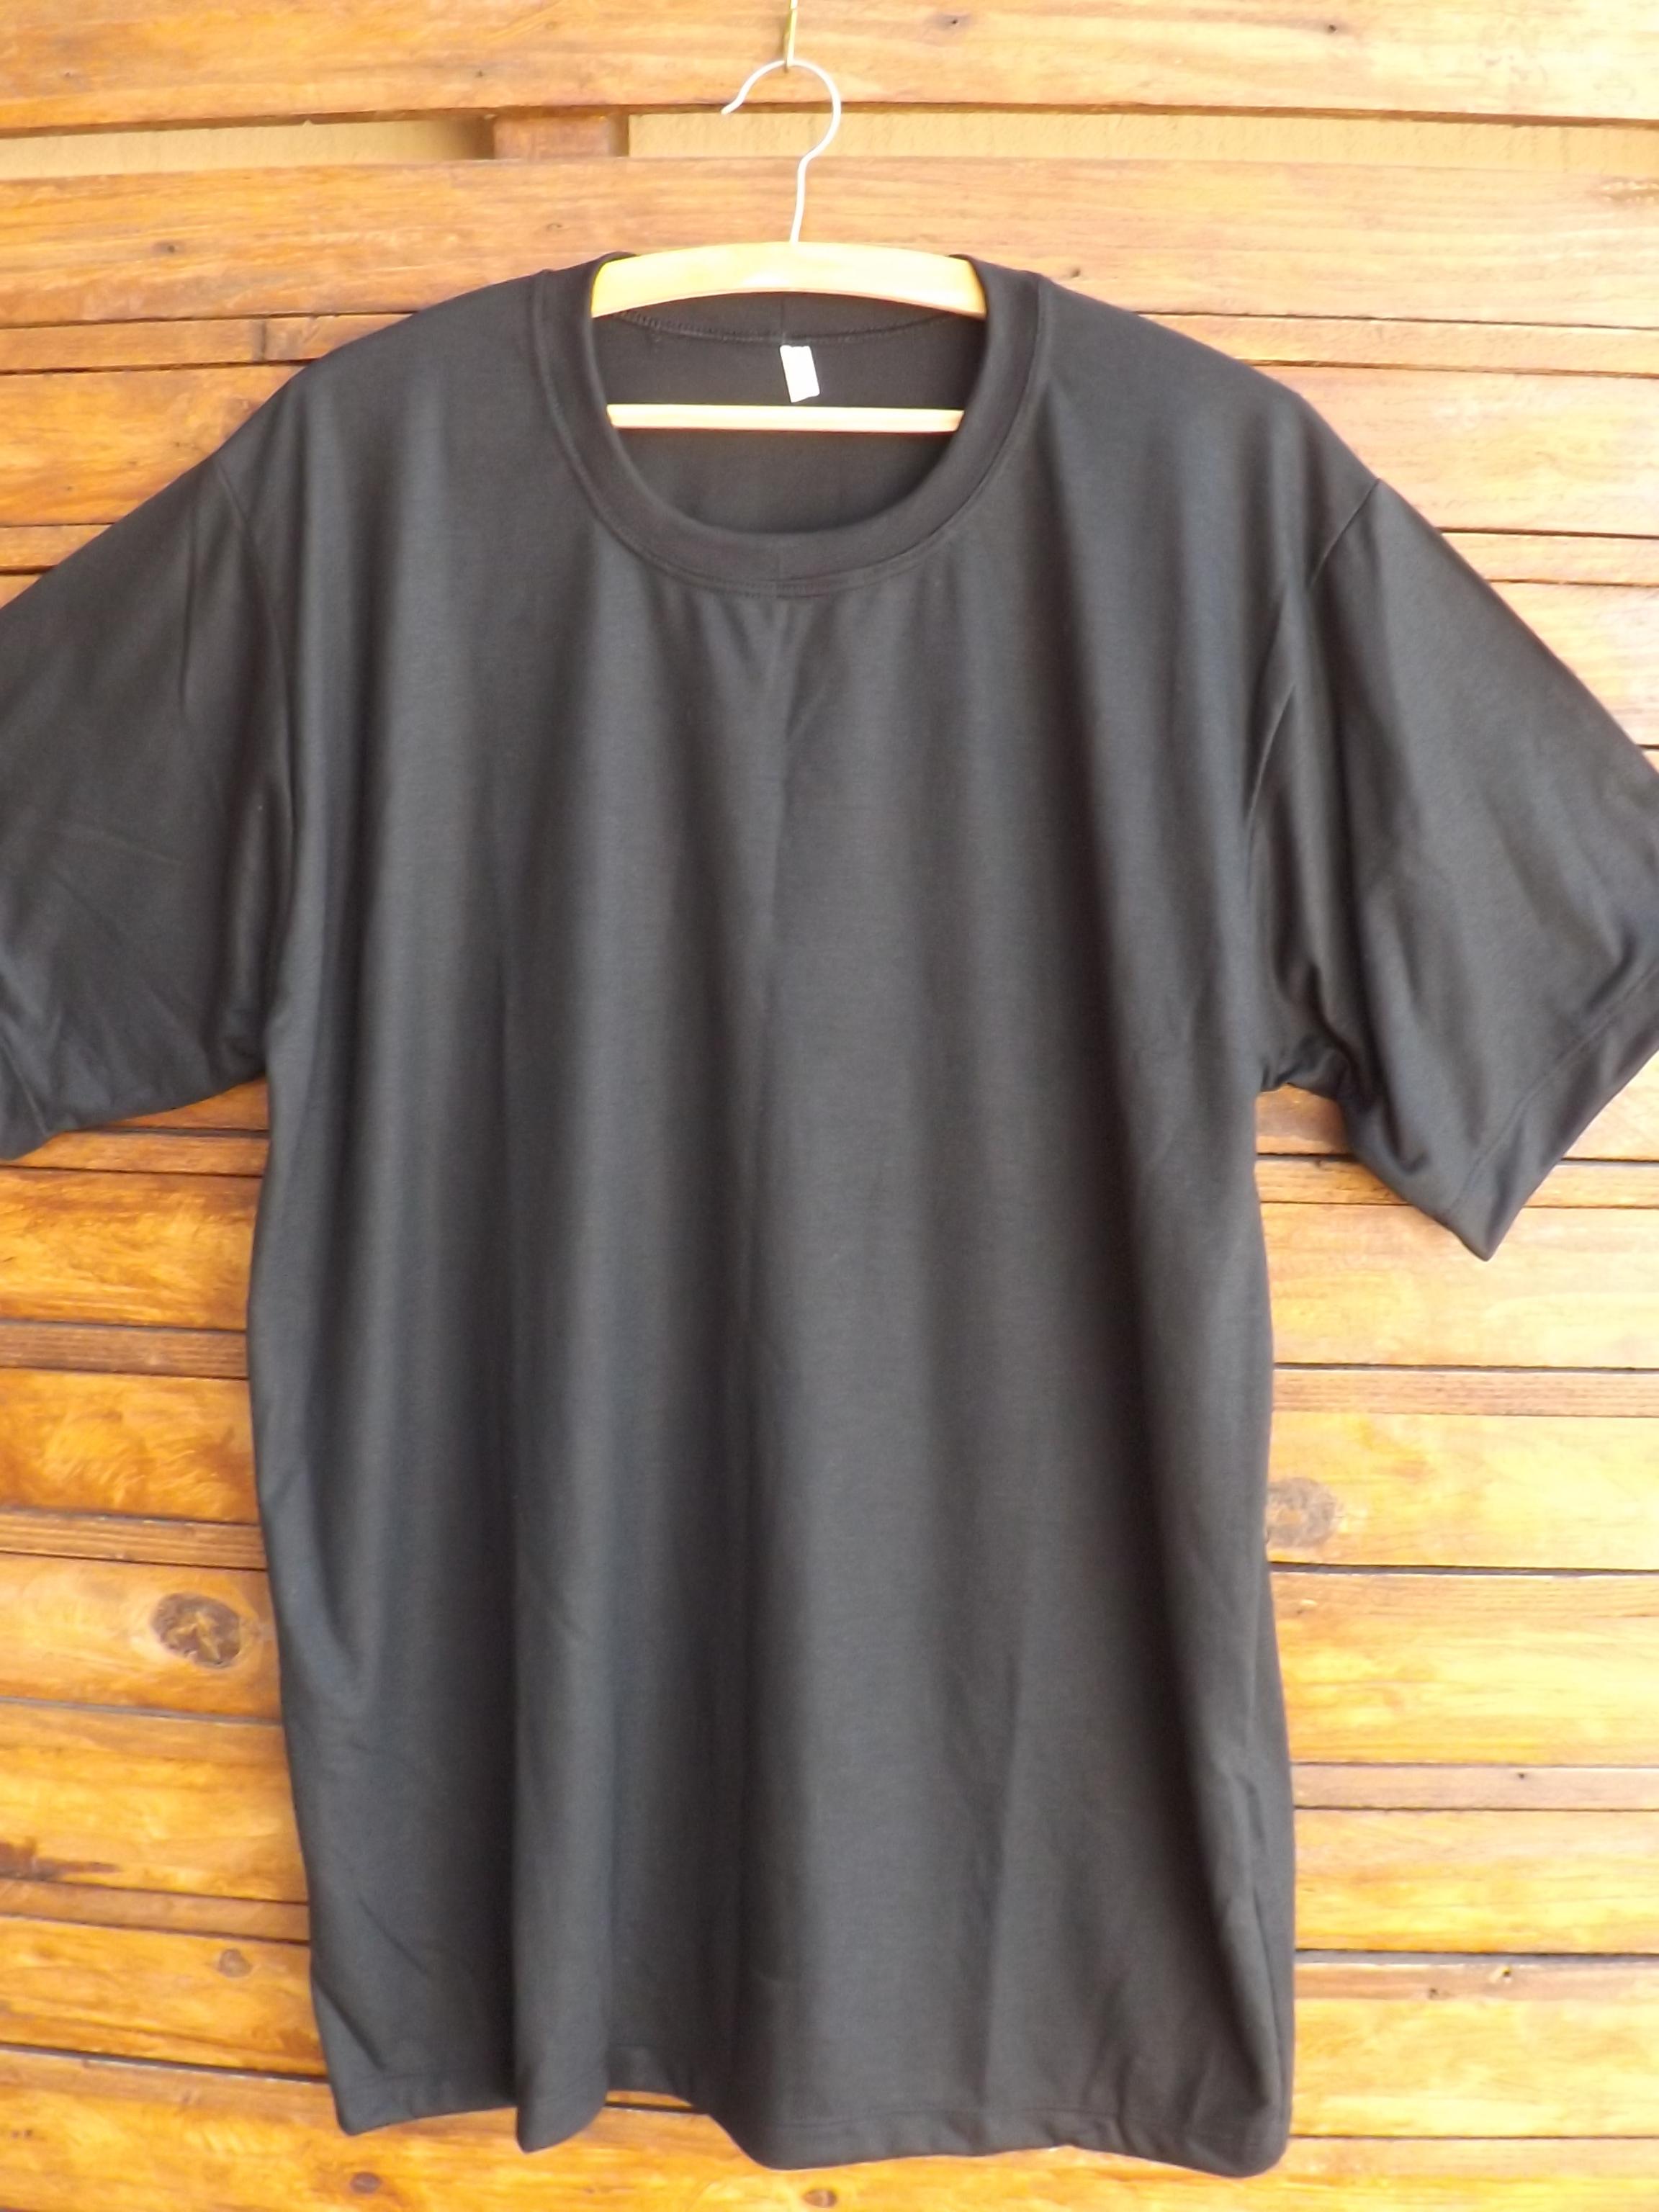 Camiseta Preta Lisa Algodao  2f745599243